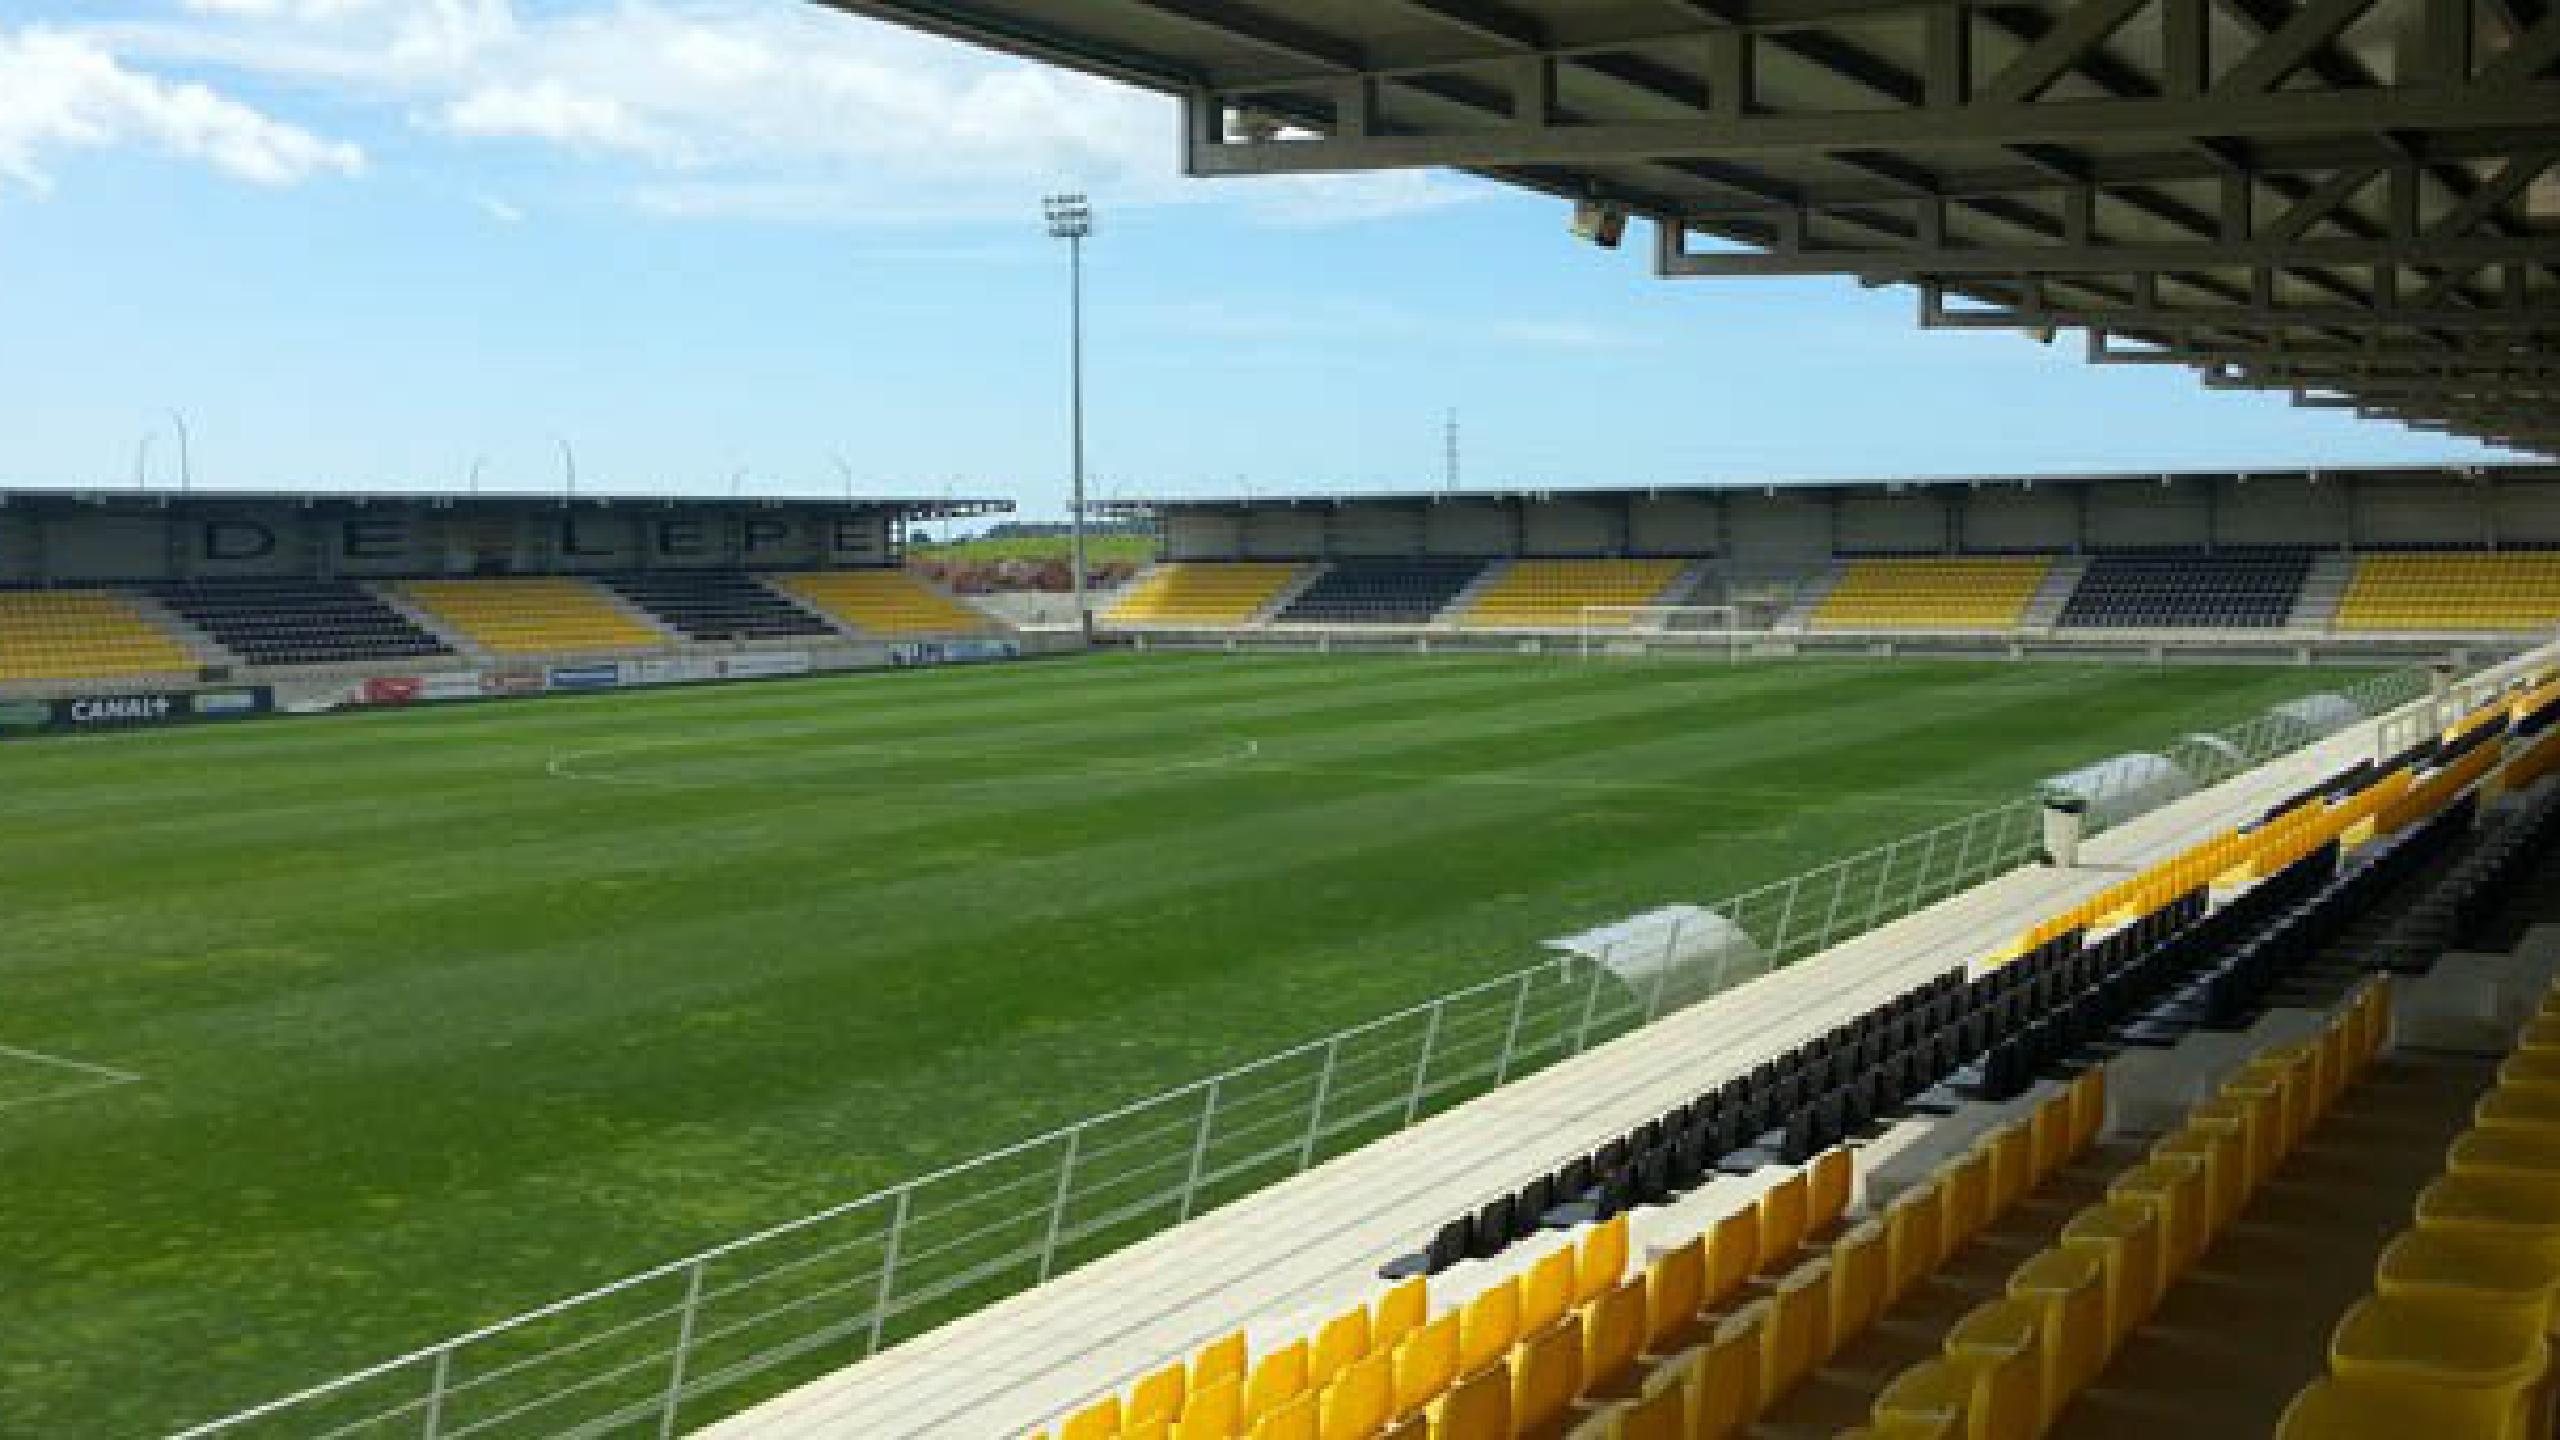 [Image: campo-de-futbol-de-lepe-1517421430.29.2560x1440.jpg]